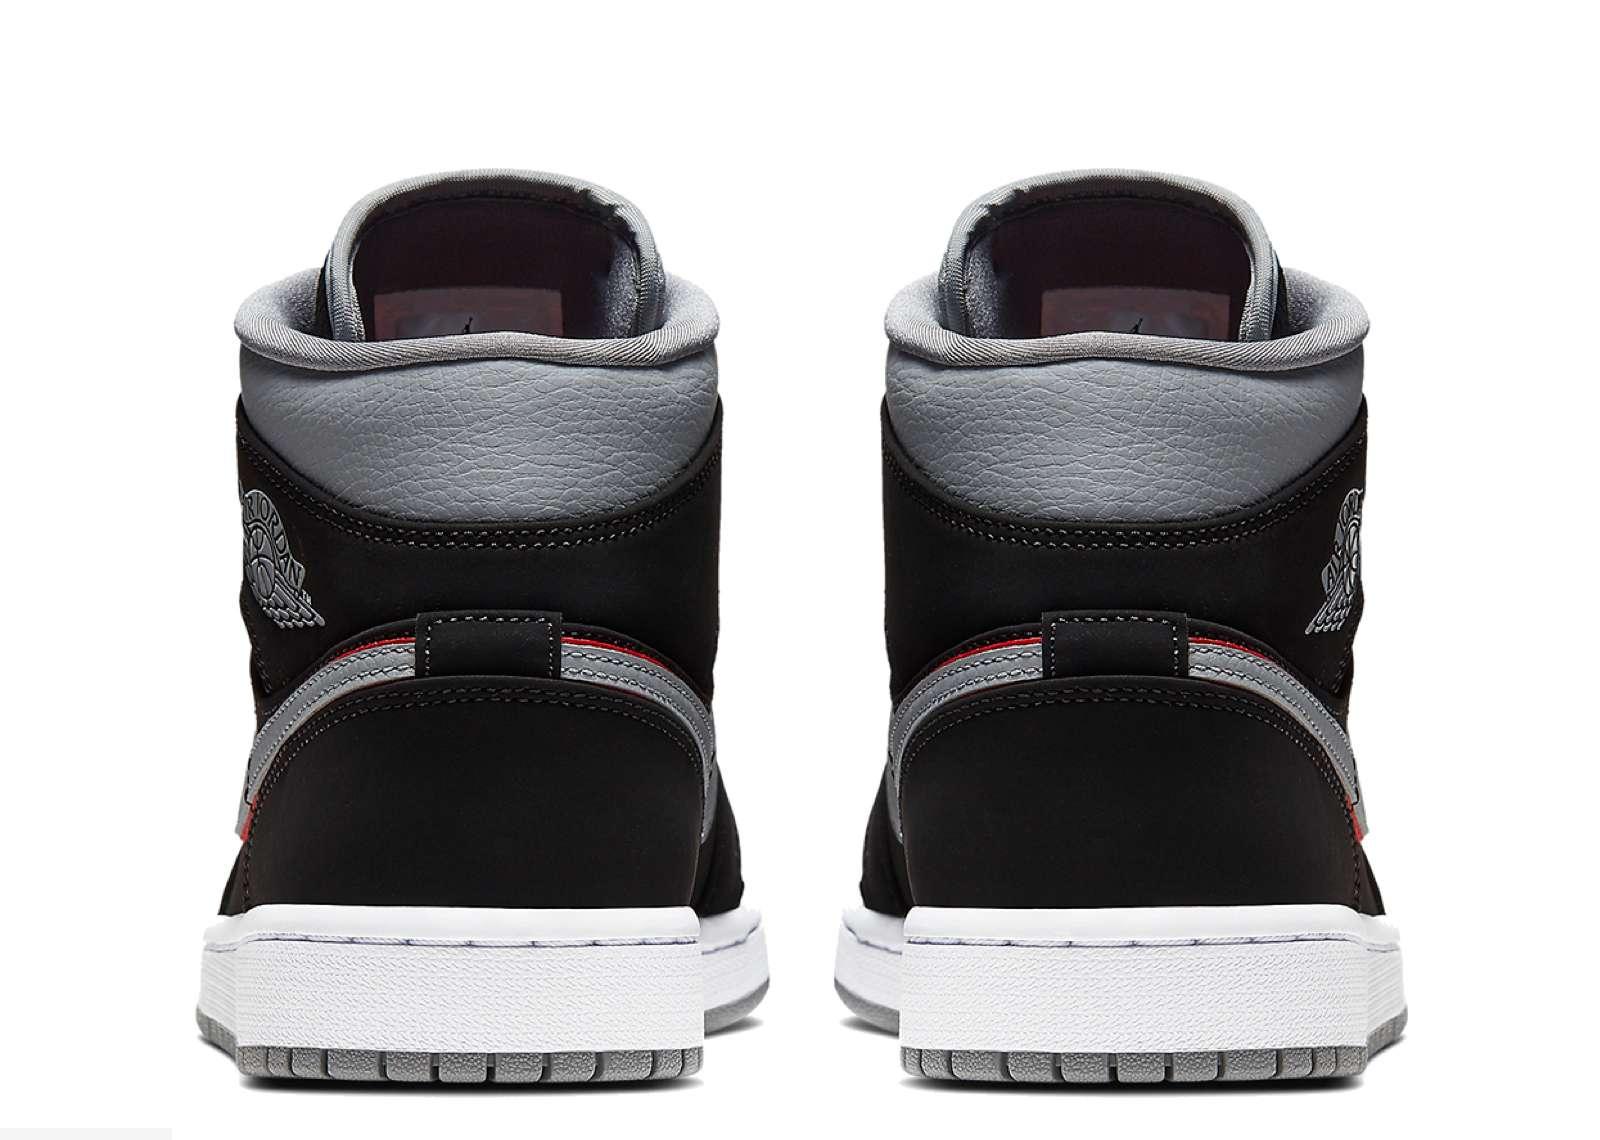 sale retailer 225bb 89e69 Jordan 1 Mid Black Particle Grey Gym Red - 4